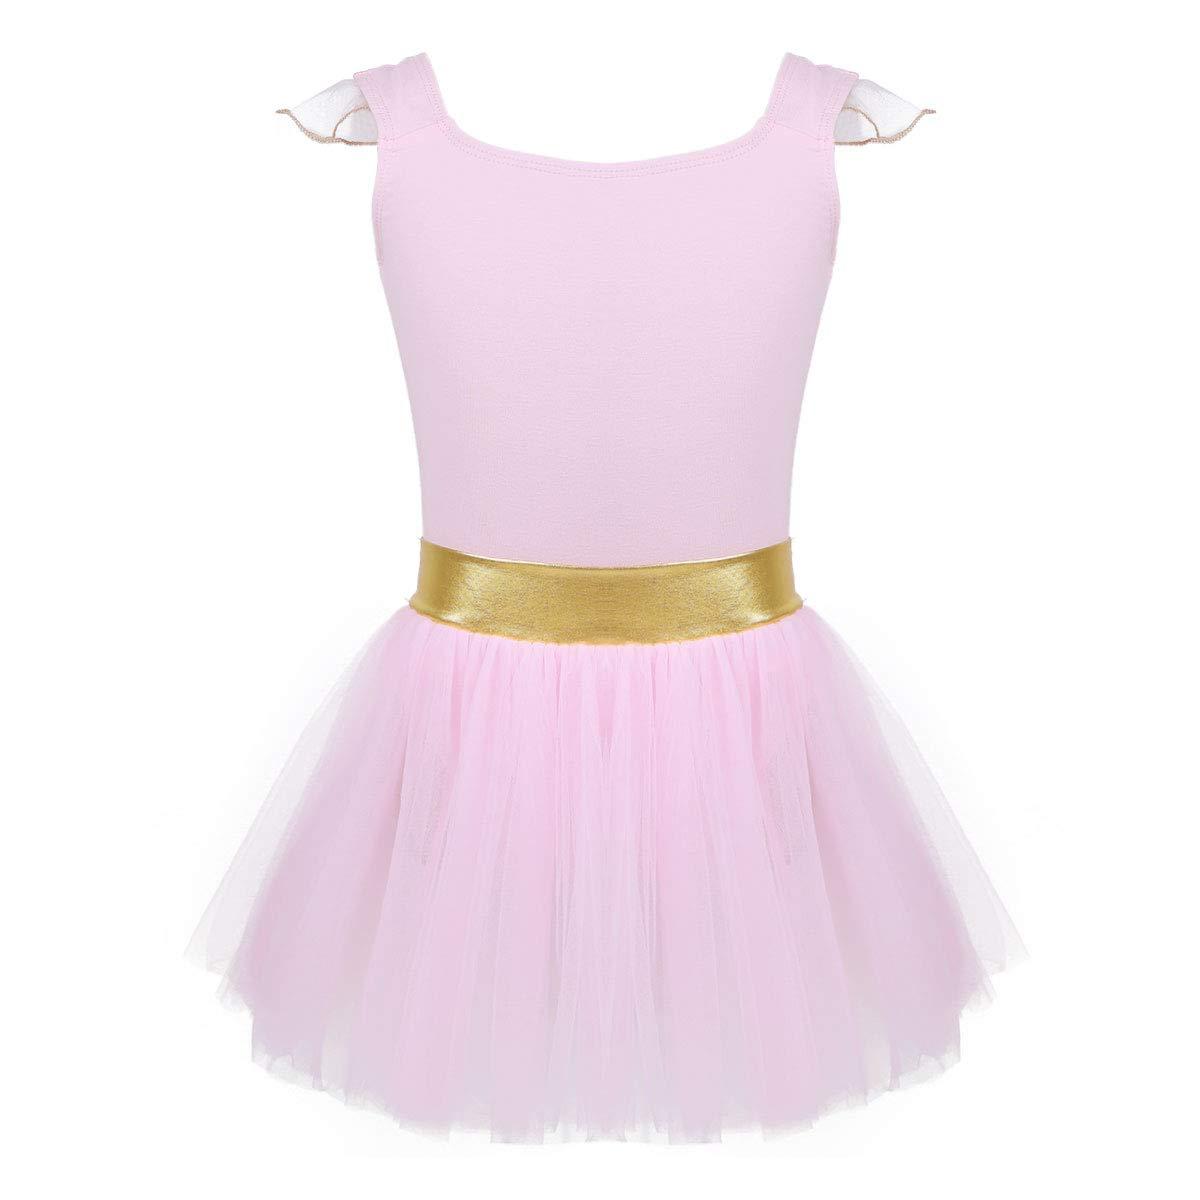 iiniim Girls Kids Ballet Dress Gymnastics Dance Leotard Costume Dancewear